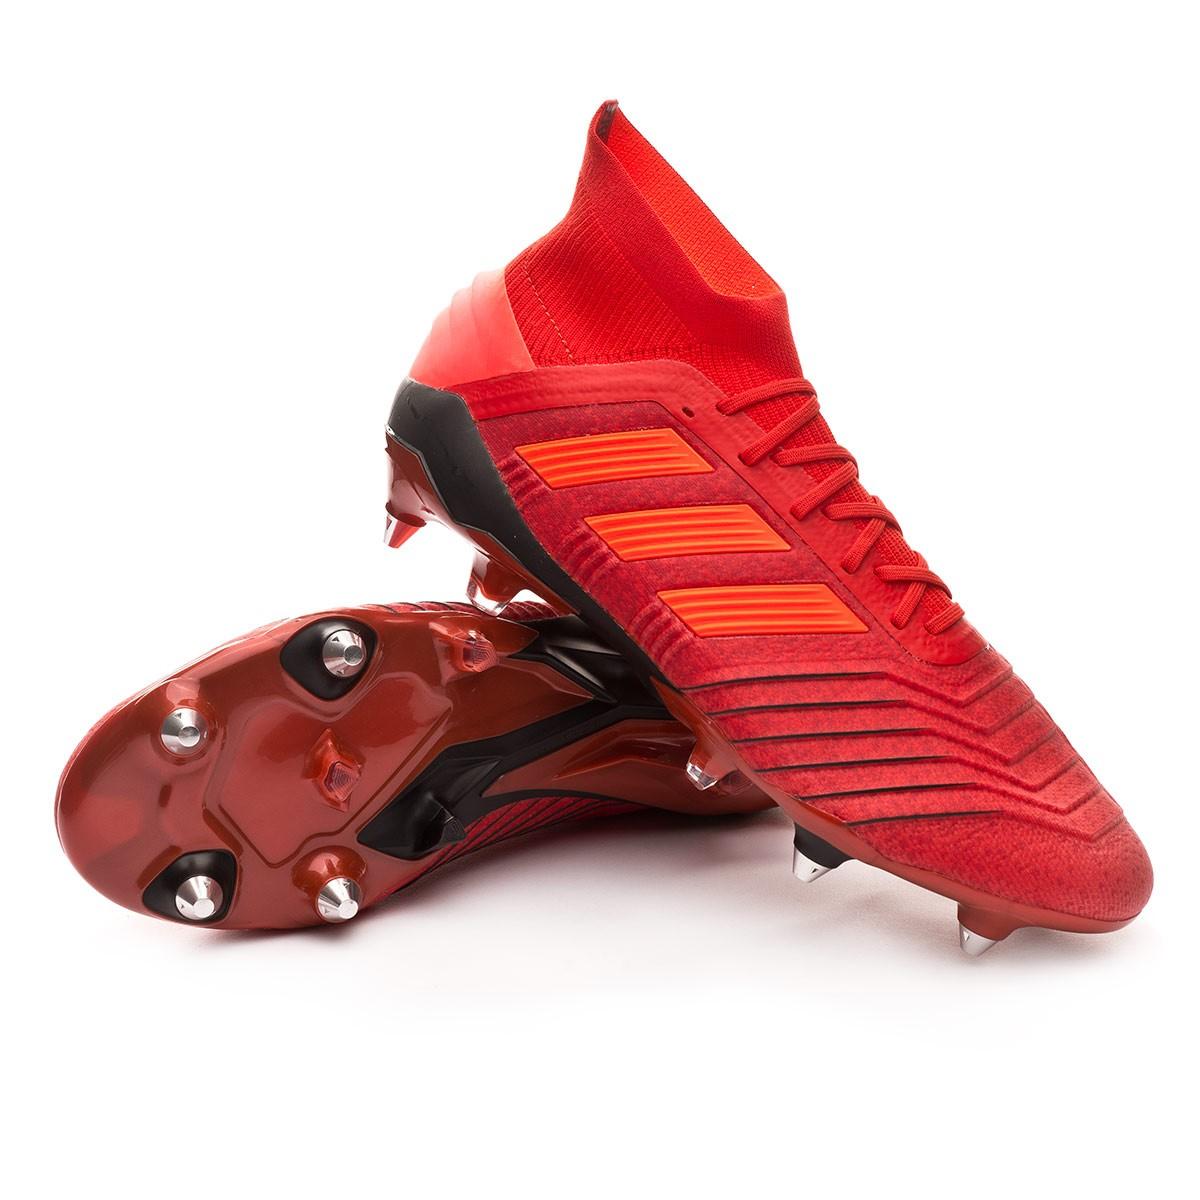 Football Boots adidas Predator 19.1 SG